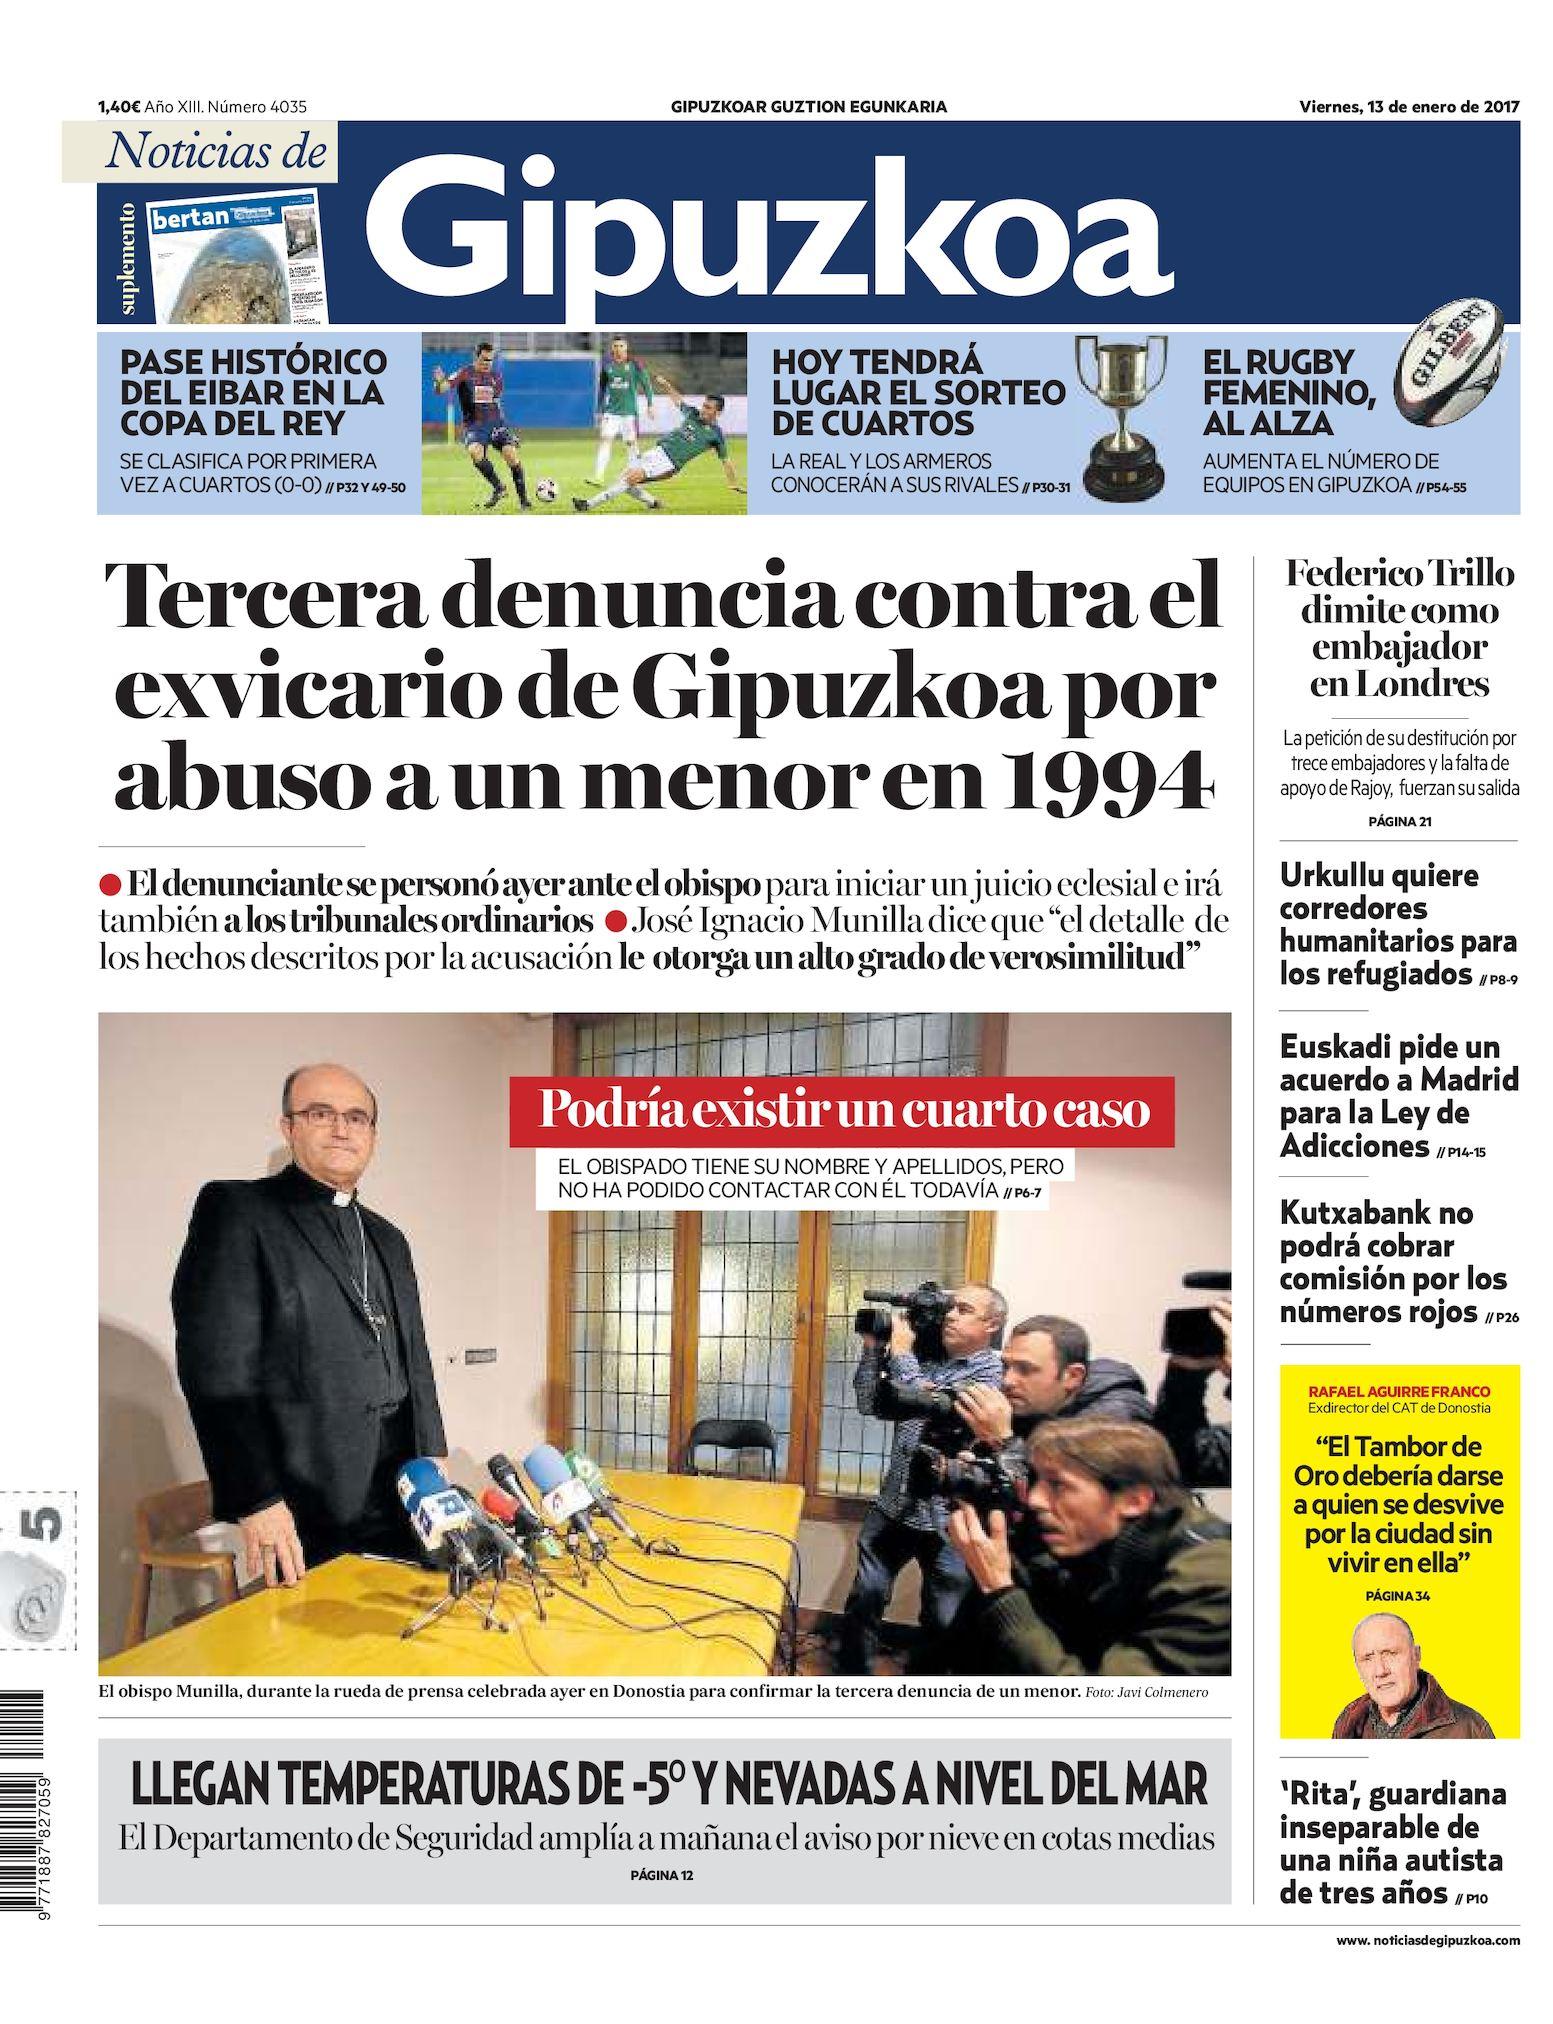 De Calaméo 20170113 Noticias De Noticias Calaméo Noticias Gipuzkoa 20170113 Gipuzkoa Calaméo De 5Rc3q4AjL